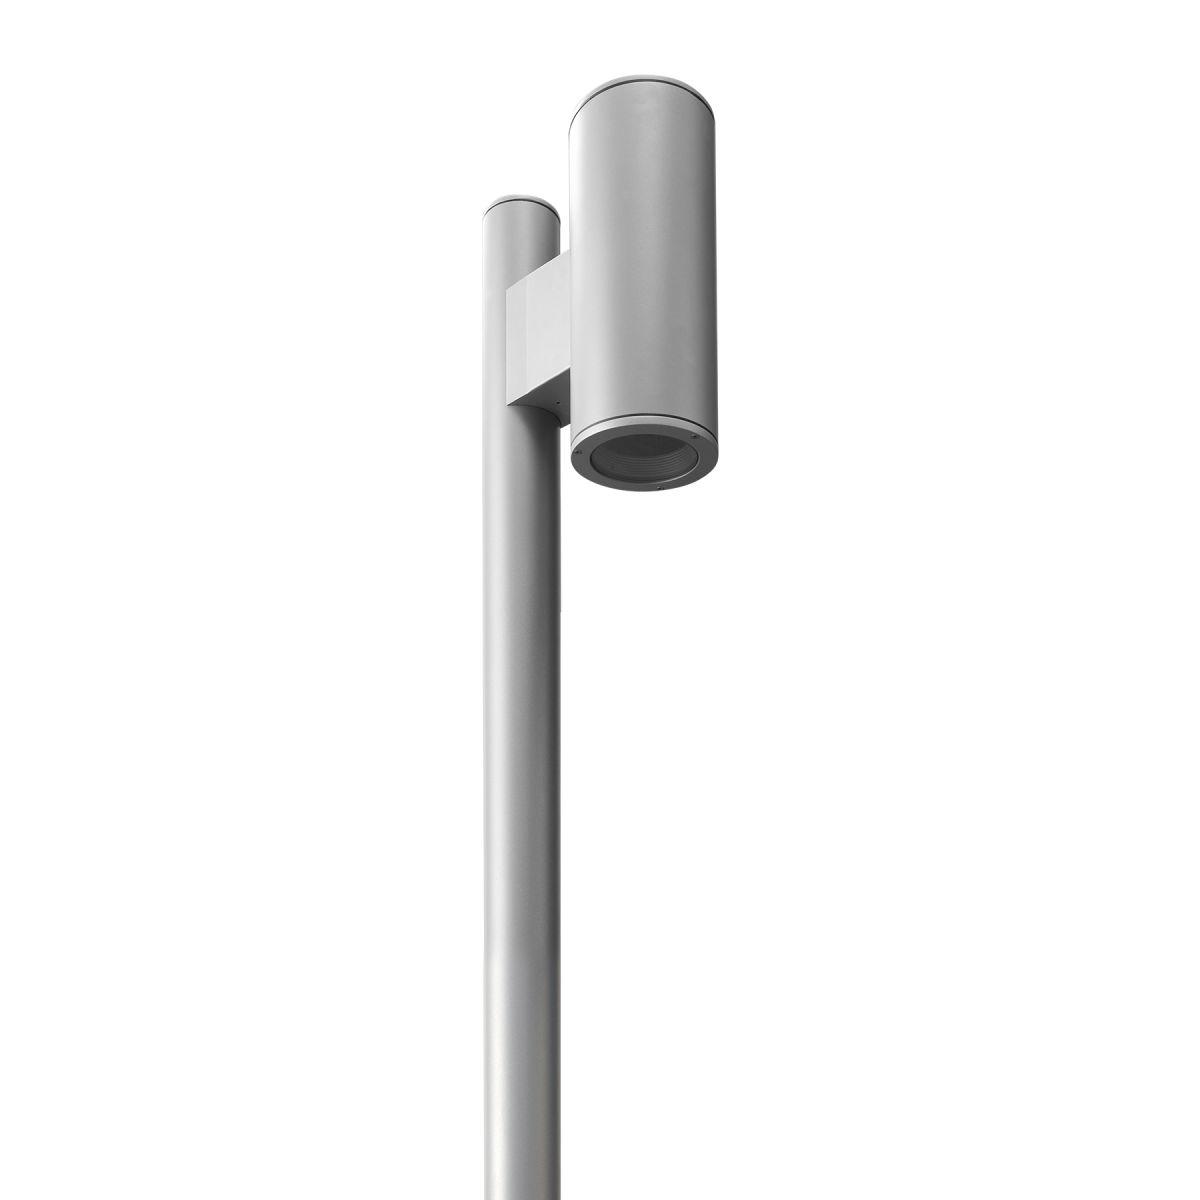 Maxi TUBE - Pole Light / Single Sided